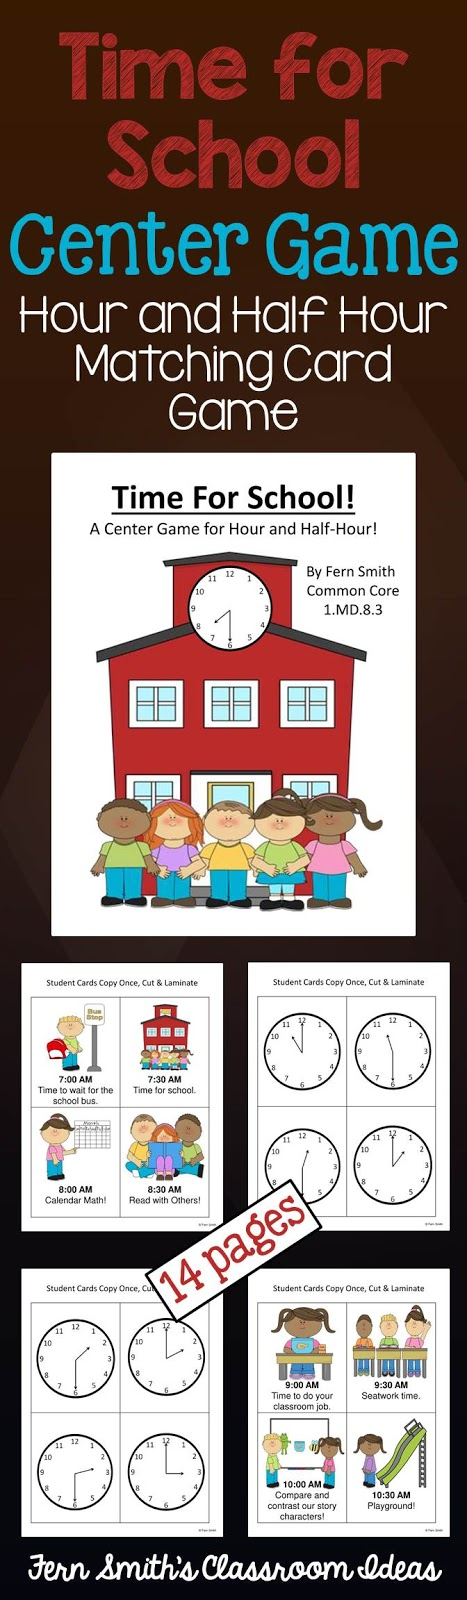 Fern Smith's Classroom Ideas Time for School Center Game at TeachersPayTeachers